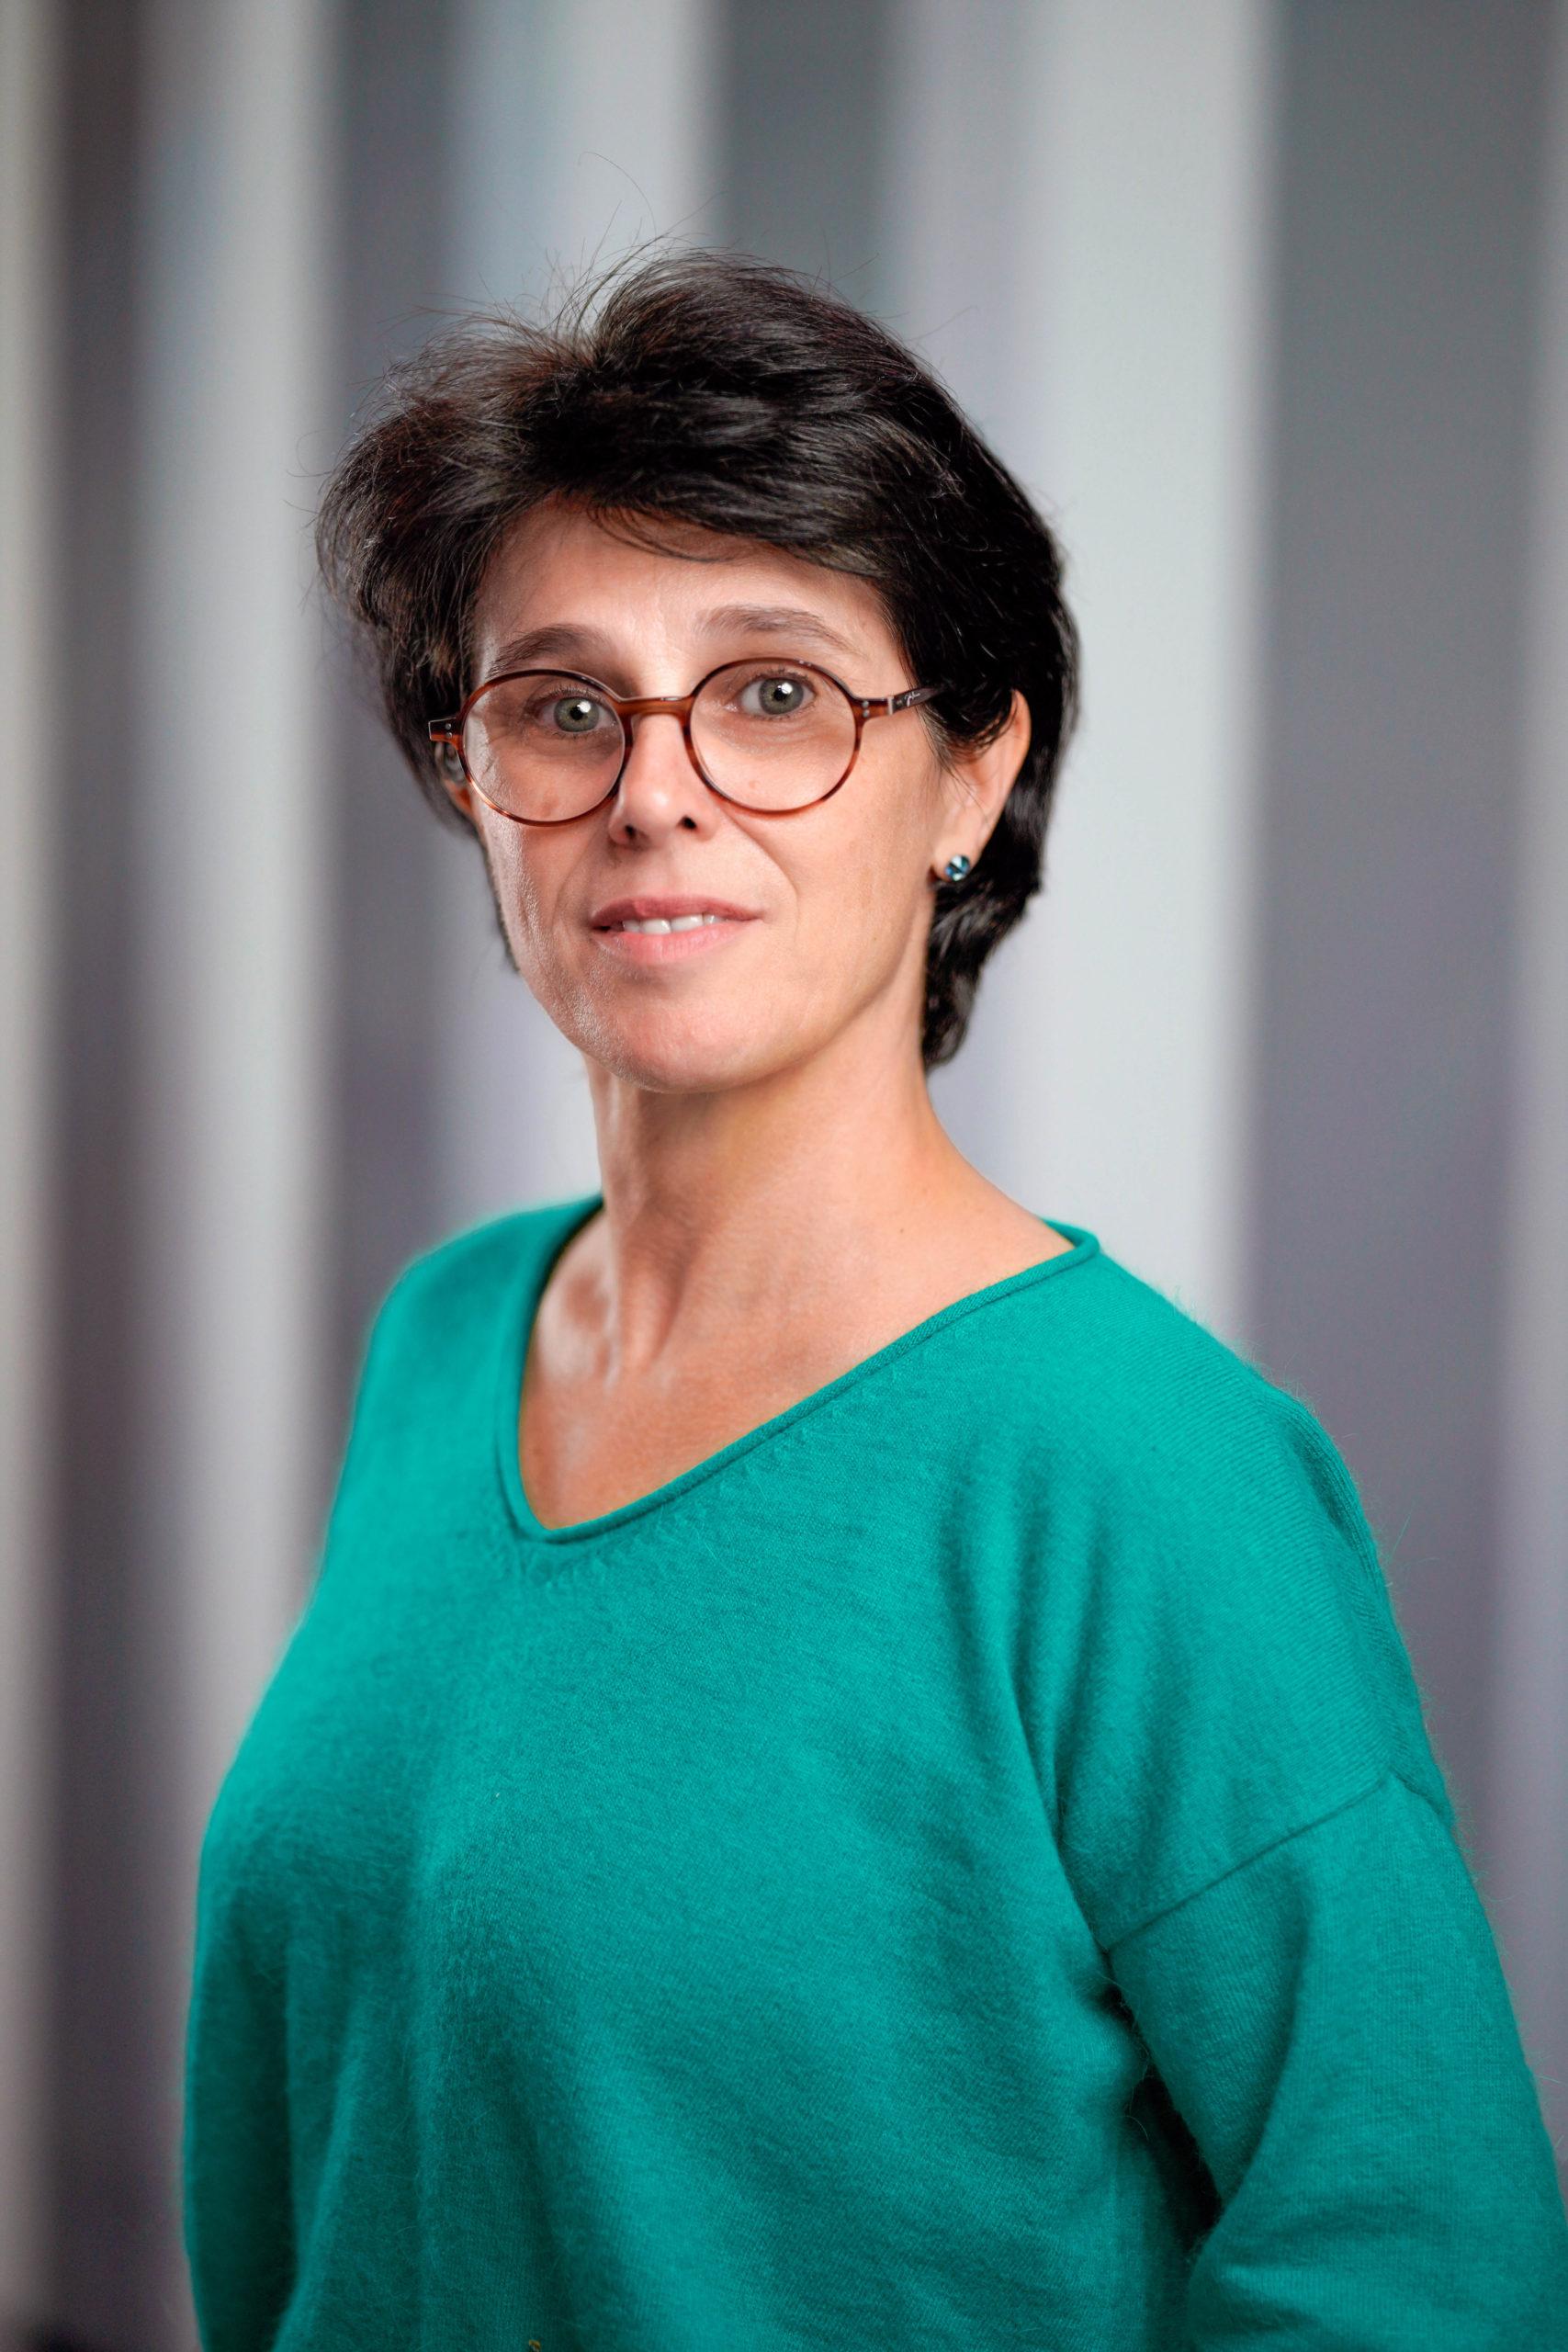 Marie-Noëlle Grandpeyre